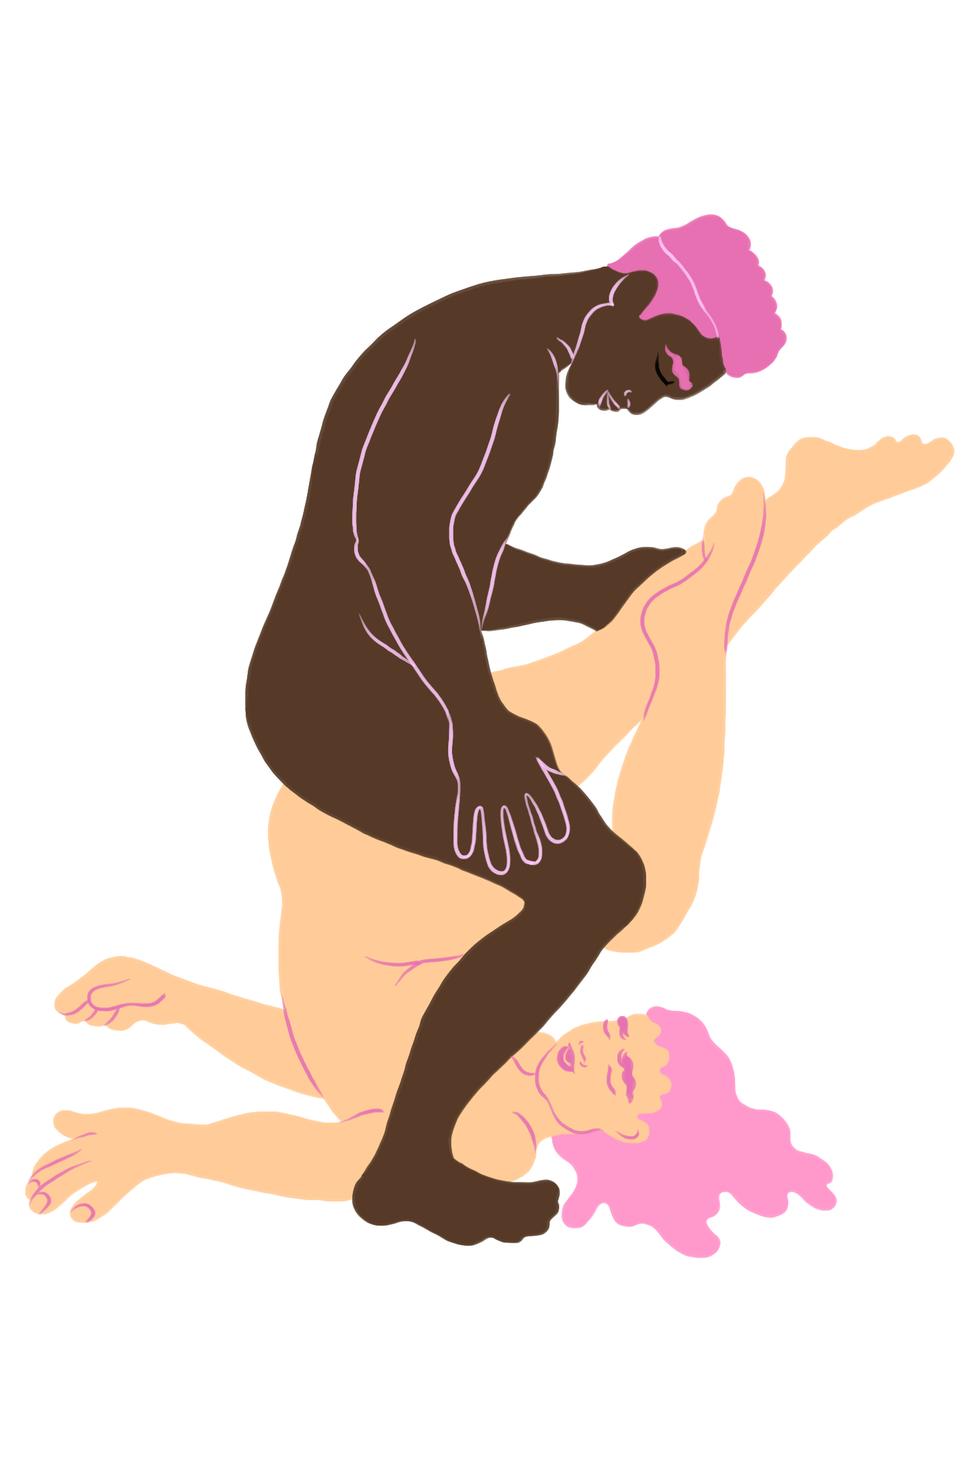 amateur omemade sex videos